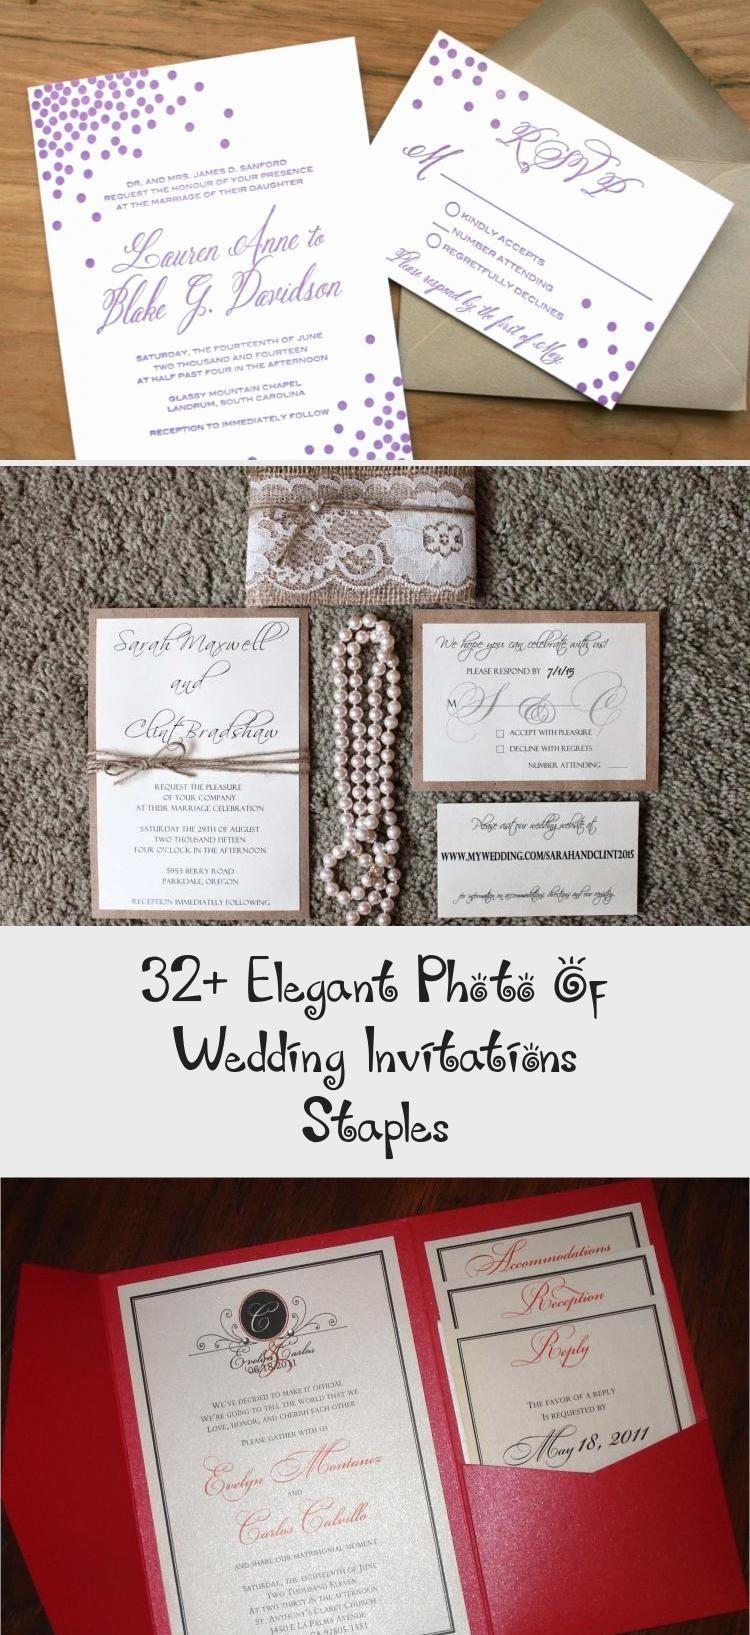 32 Elegant Photo Of Wedding Invitations Staples Wedding Invitations Staples Staples Wedding Invitations Printing Wedding Invitations Wedding Invitation Cards